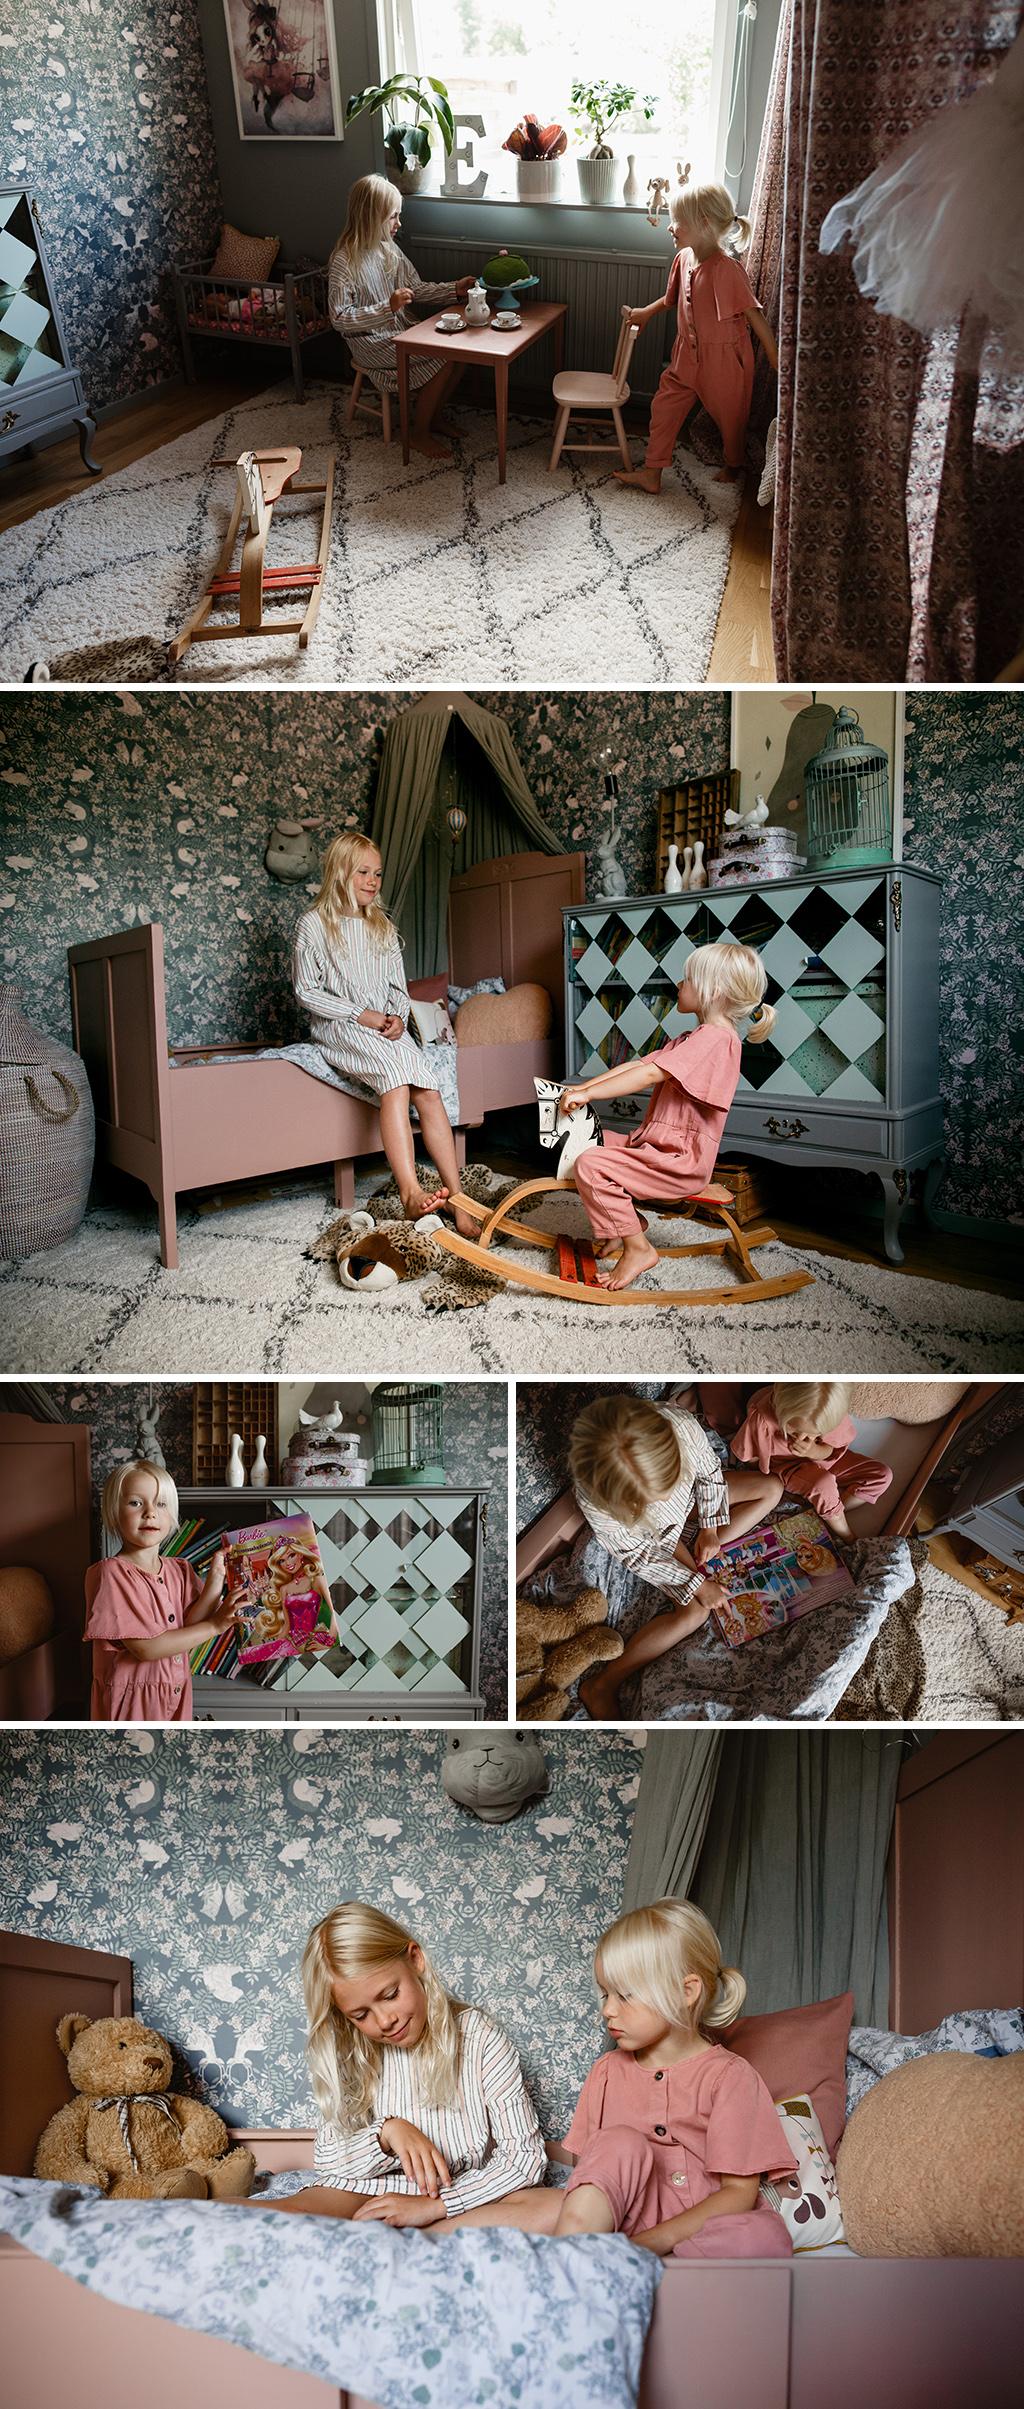 Lifestyle_familjefotografering_Stockholm_hemma-hos-fotografering_lifestyle-inhome-session_7.jpg